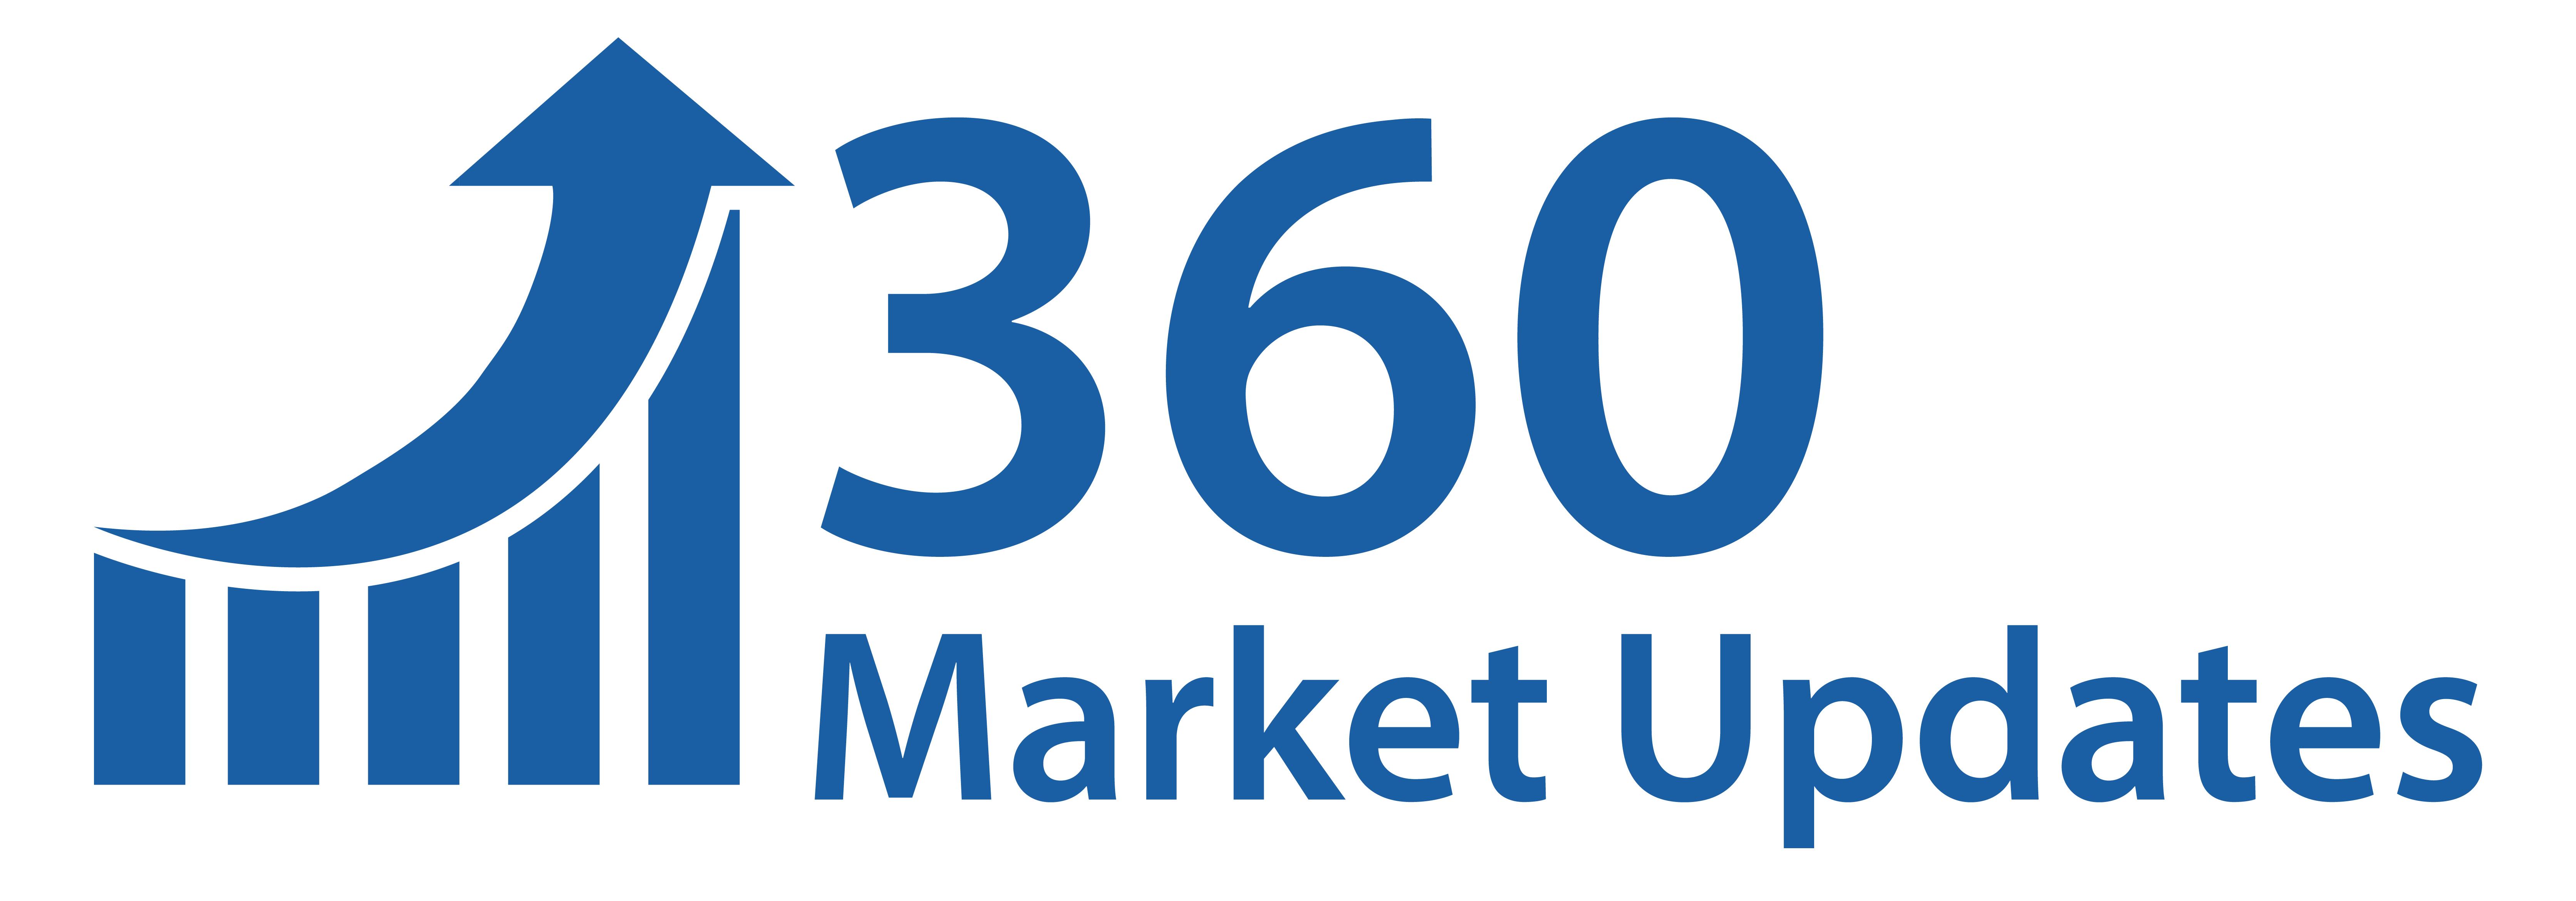 Aluminum Billets Series 1000 Market Research Report 2020-2026| Comprehensive Study, Development Status, Opportunities, Future Plans, Competitive Landscape and Growth